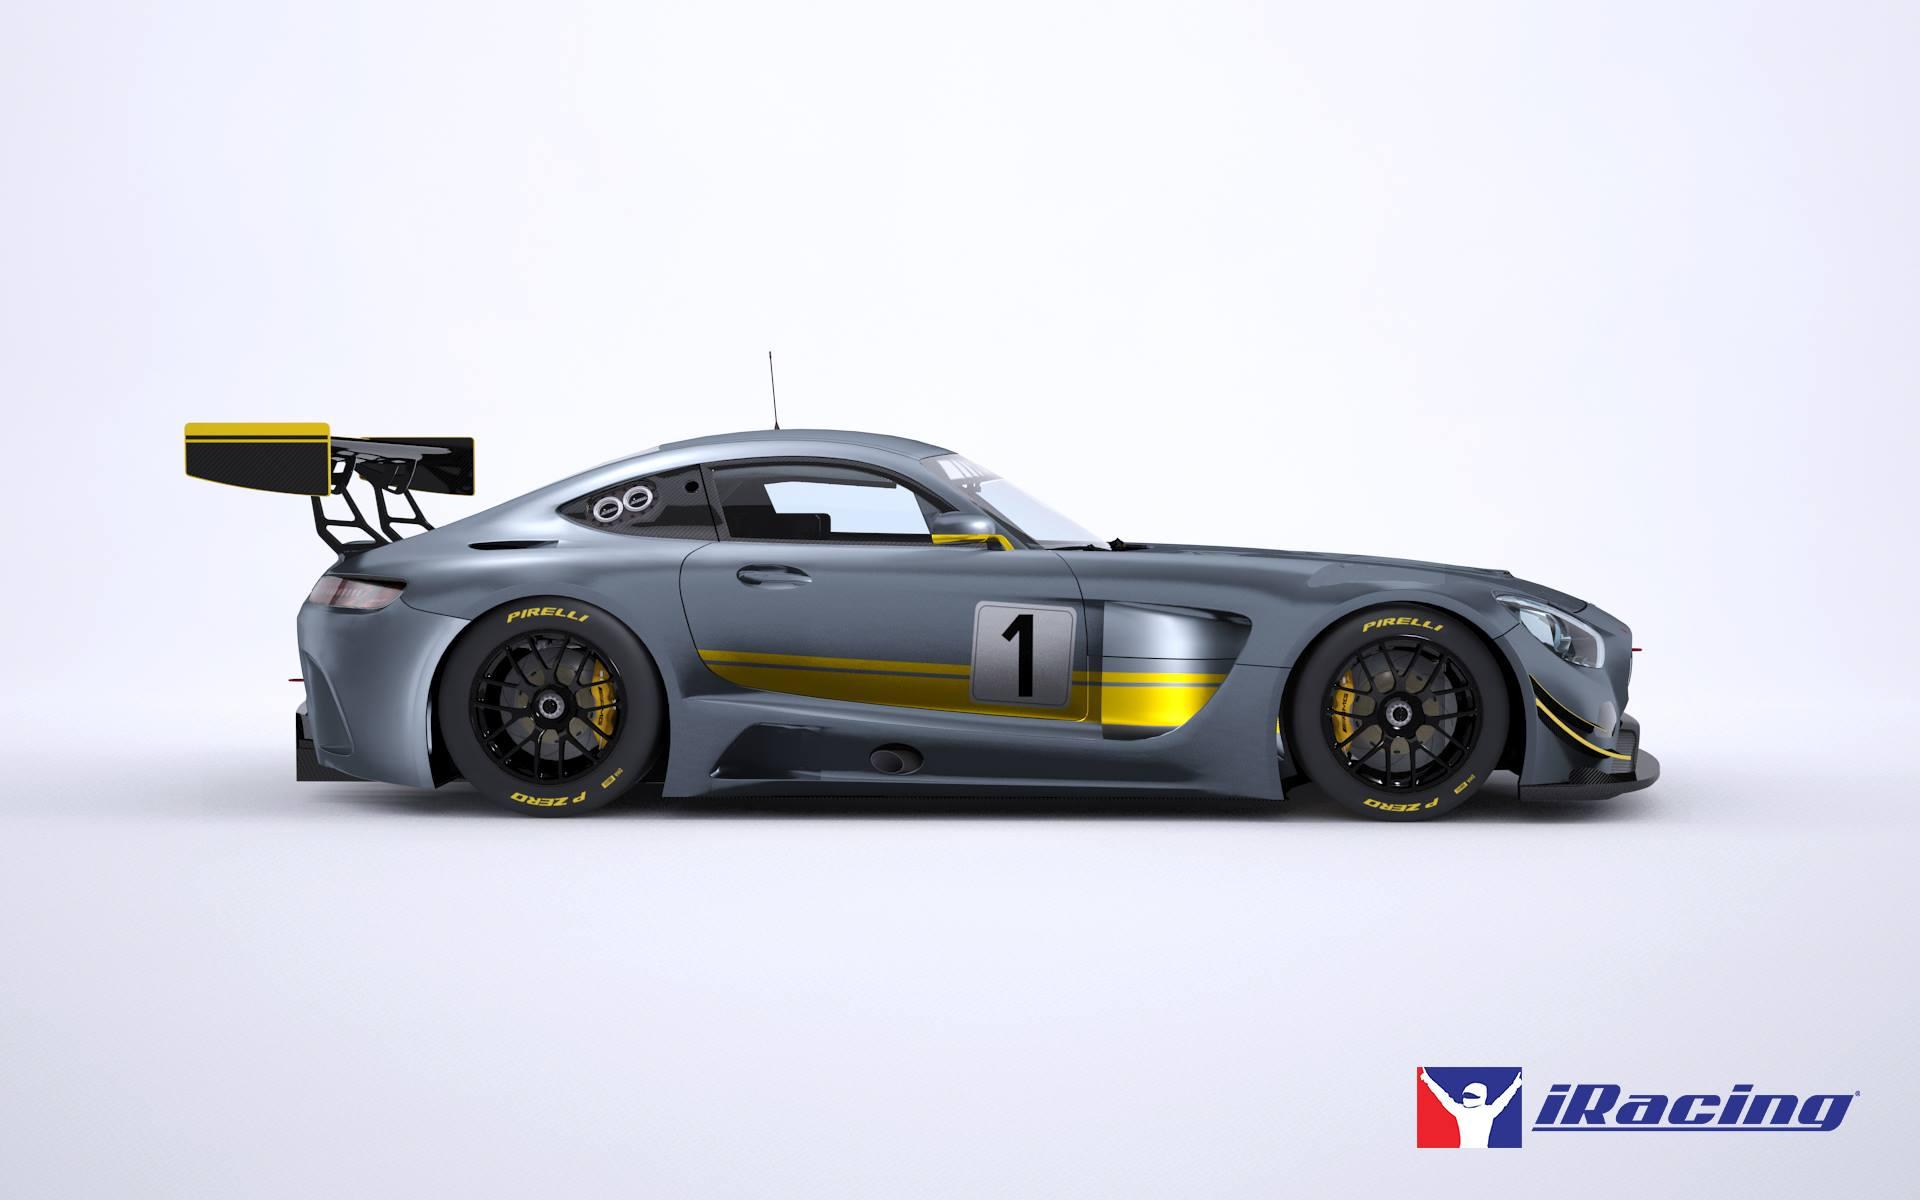 2016-mercedes-amg-gt3-race-car 2.jpg